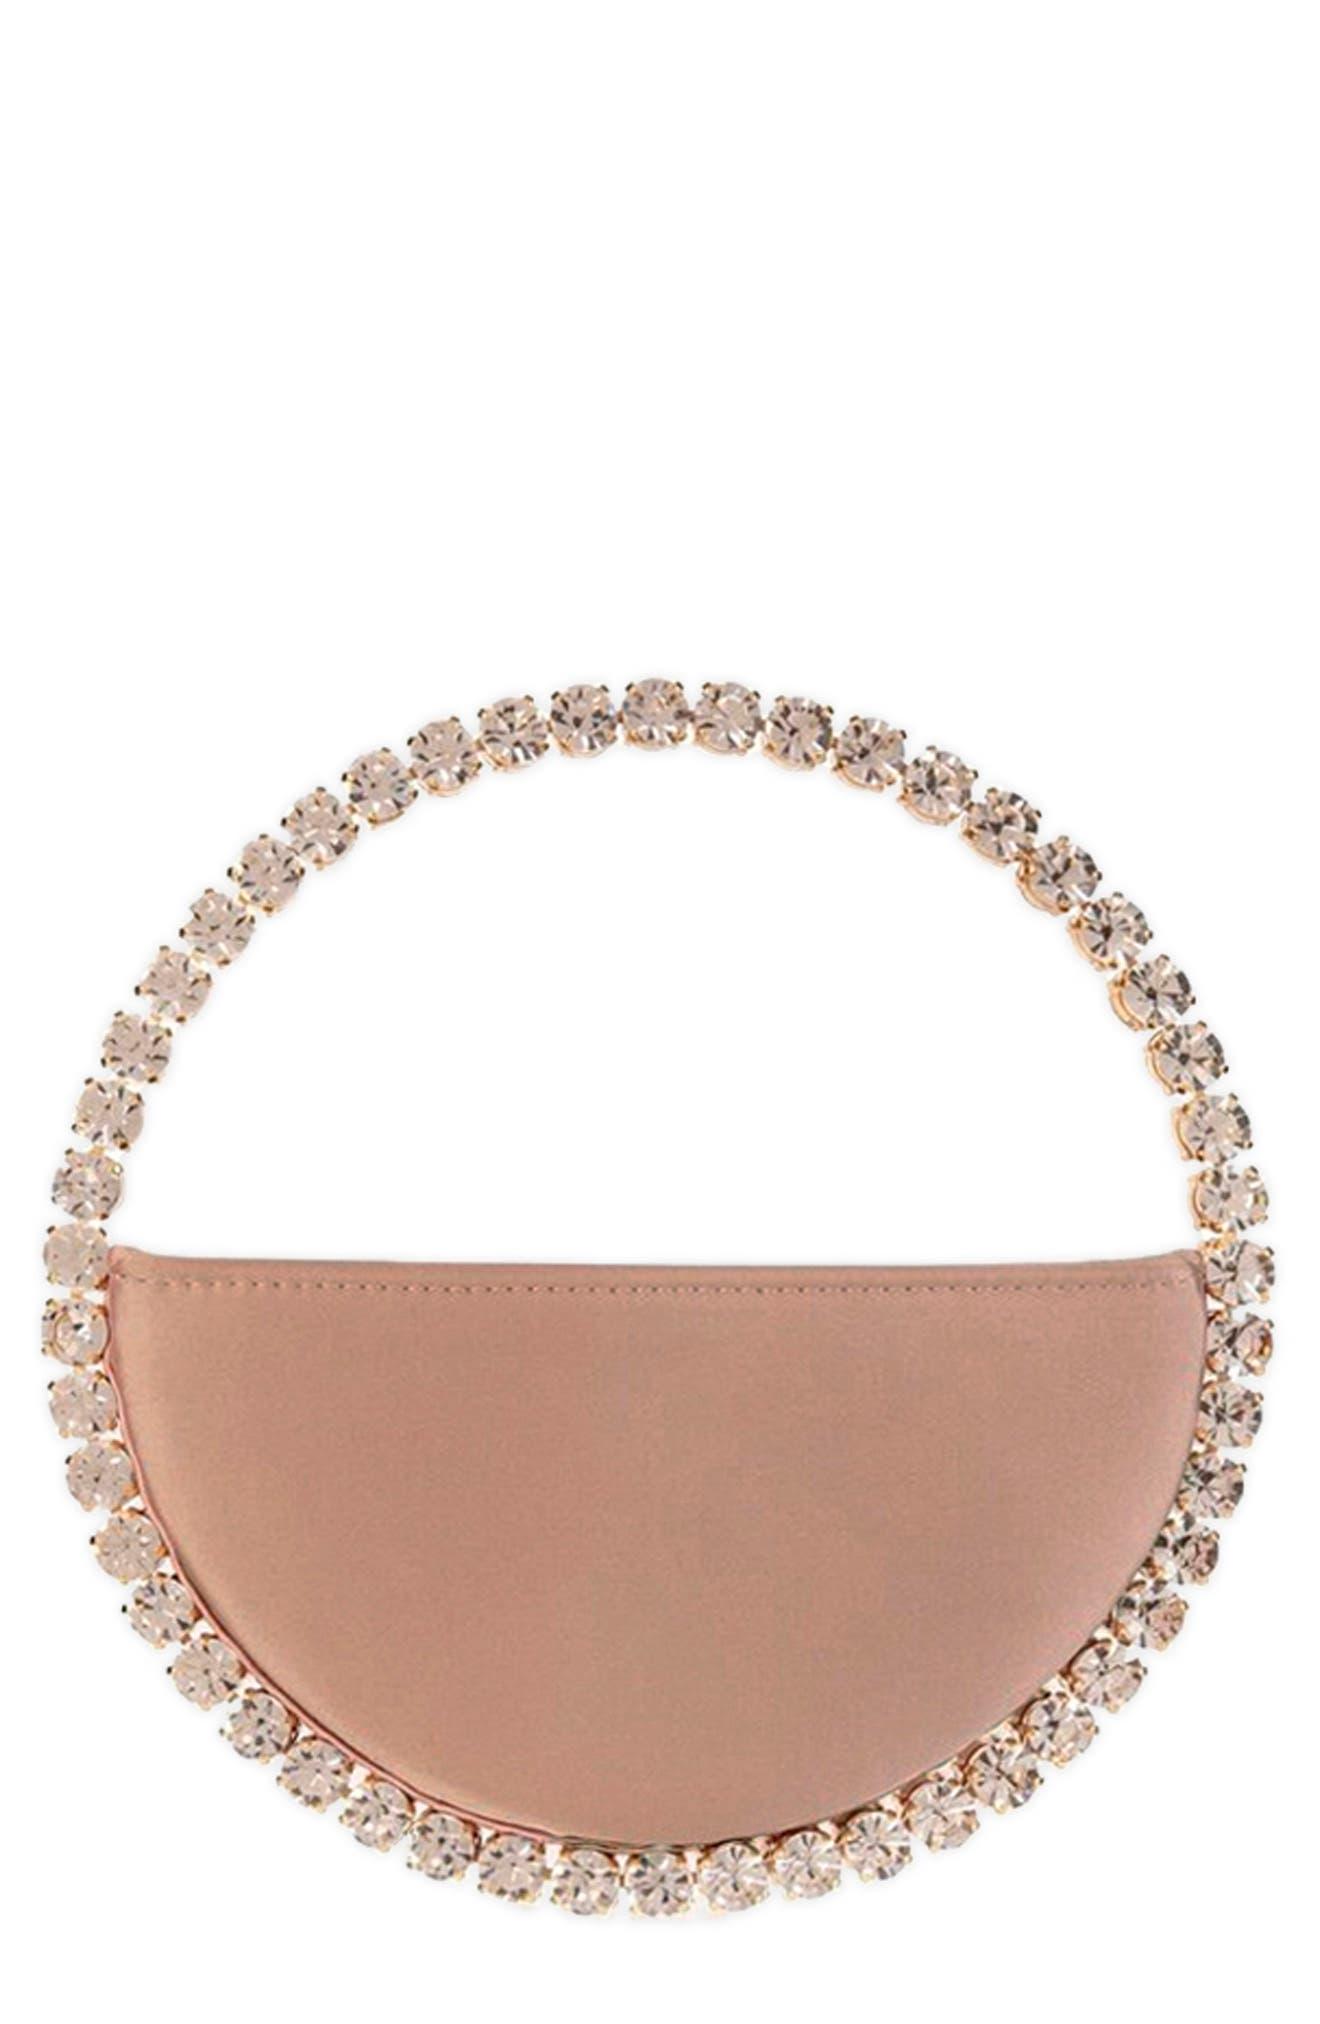 Eternity Rainbow Crystal Top Handle Bag